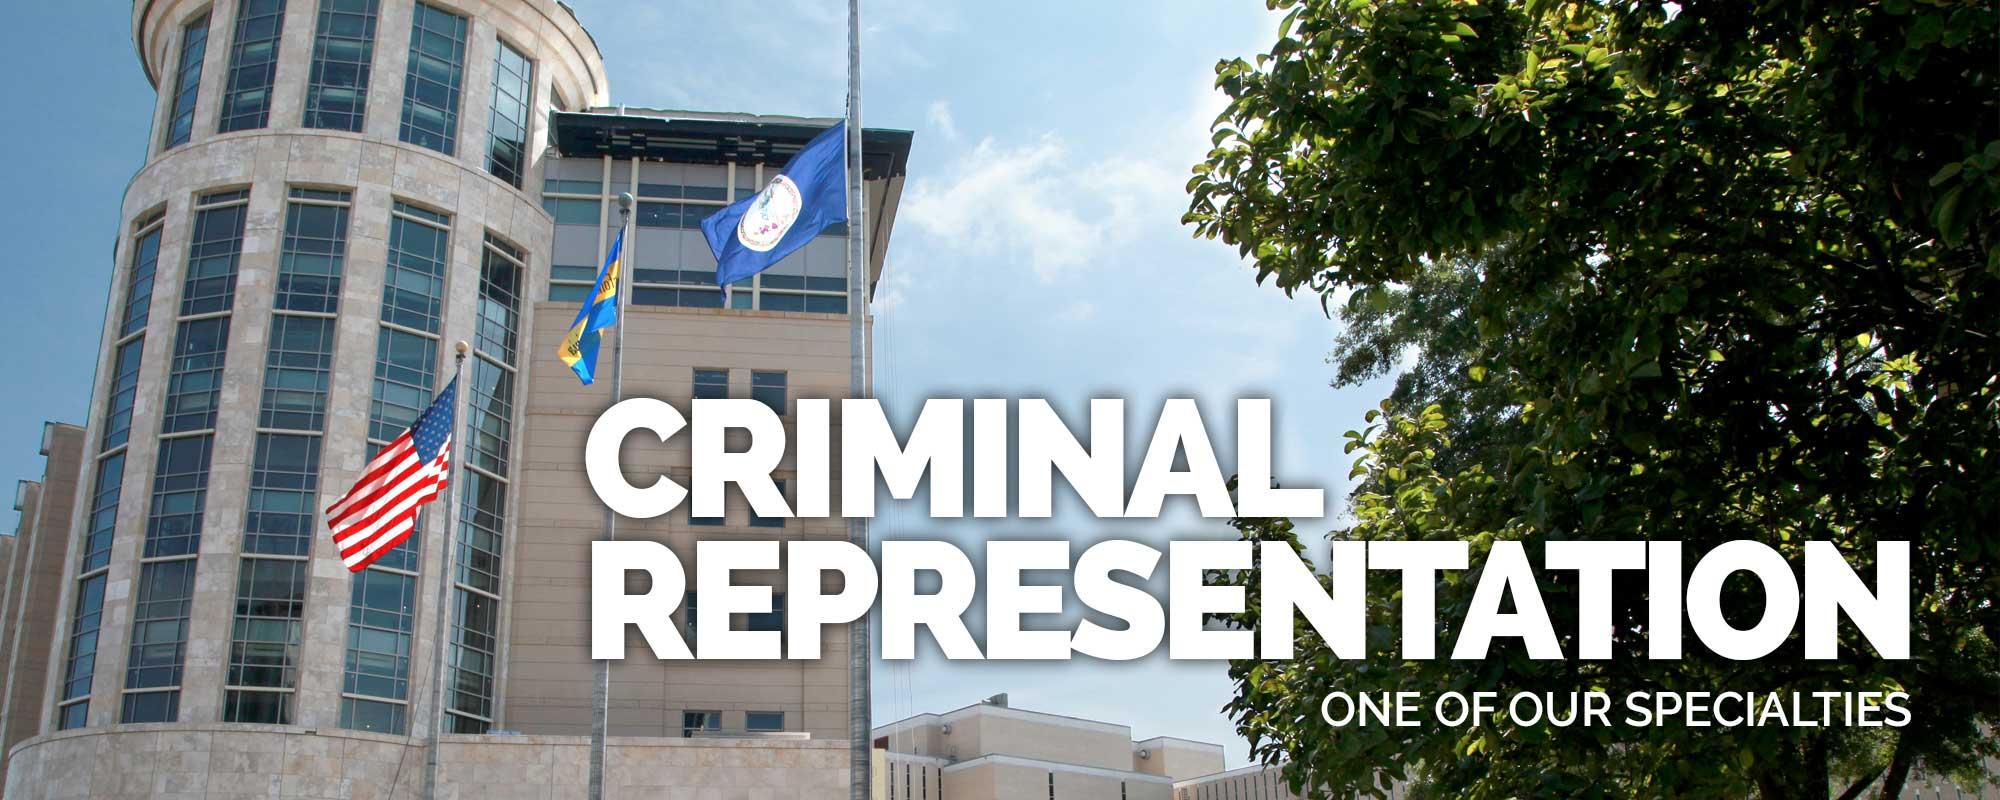 criminal-representation